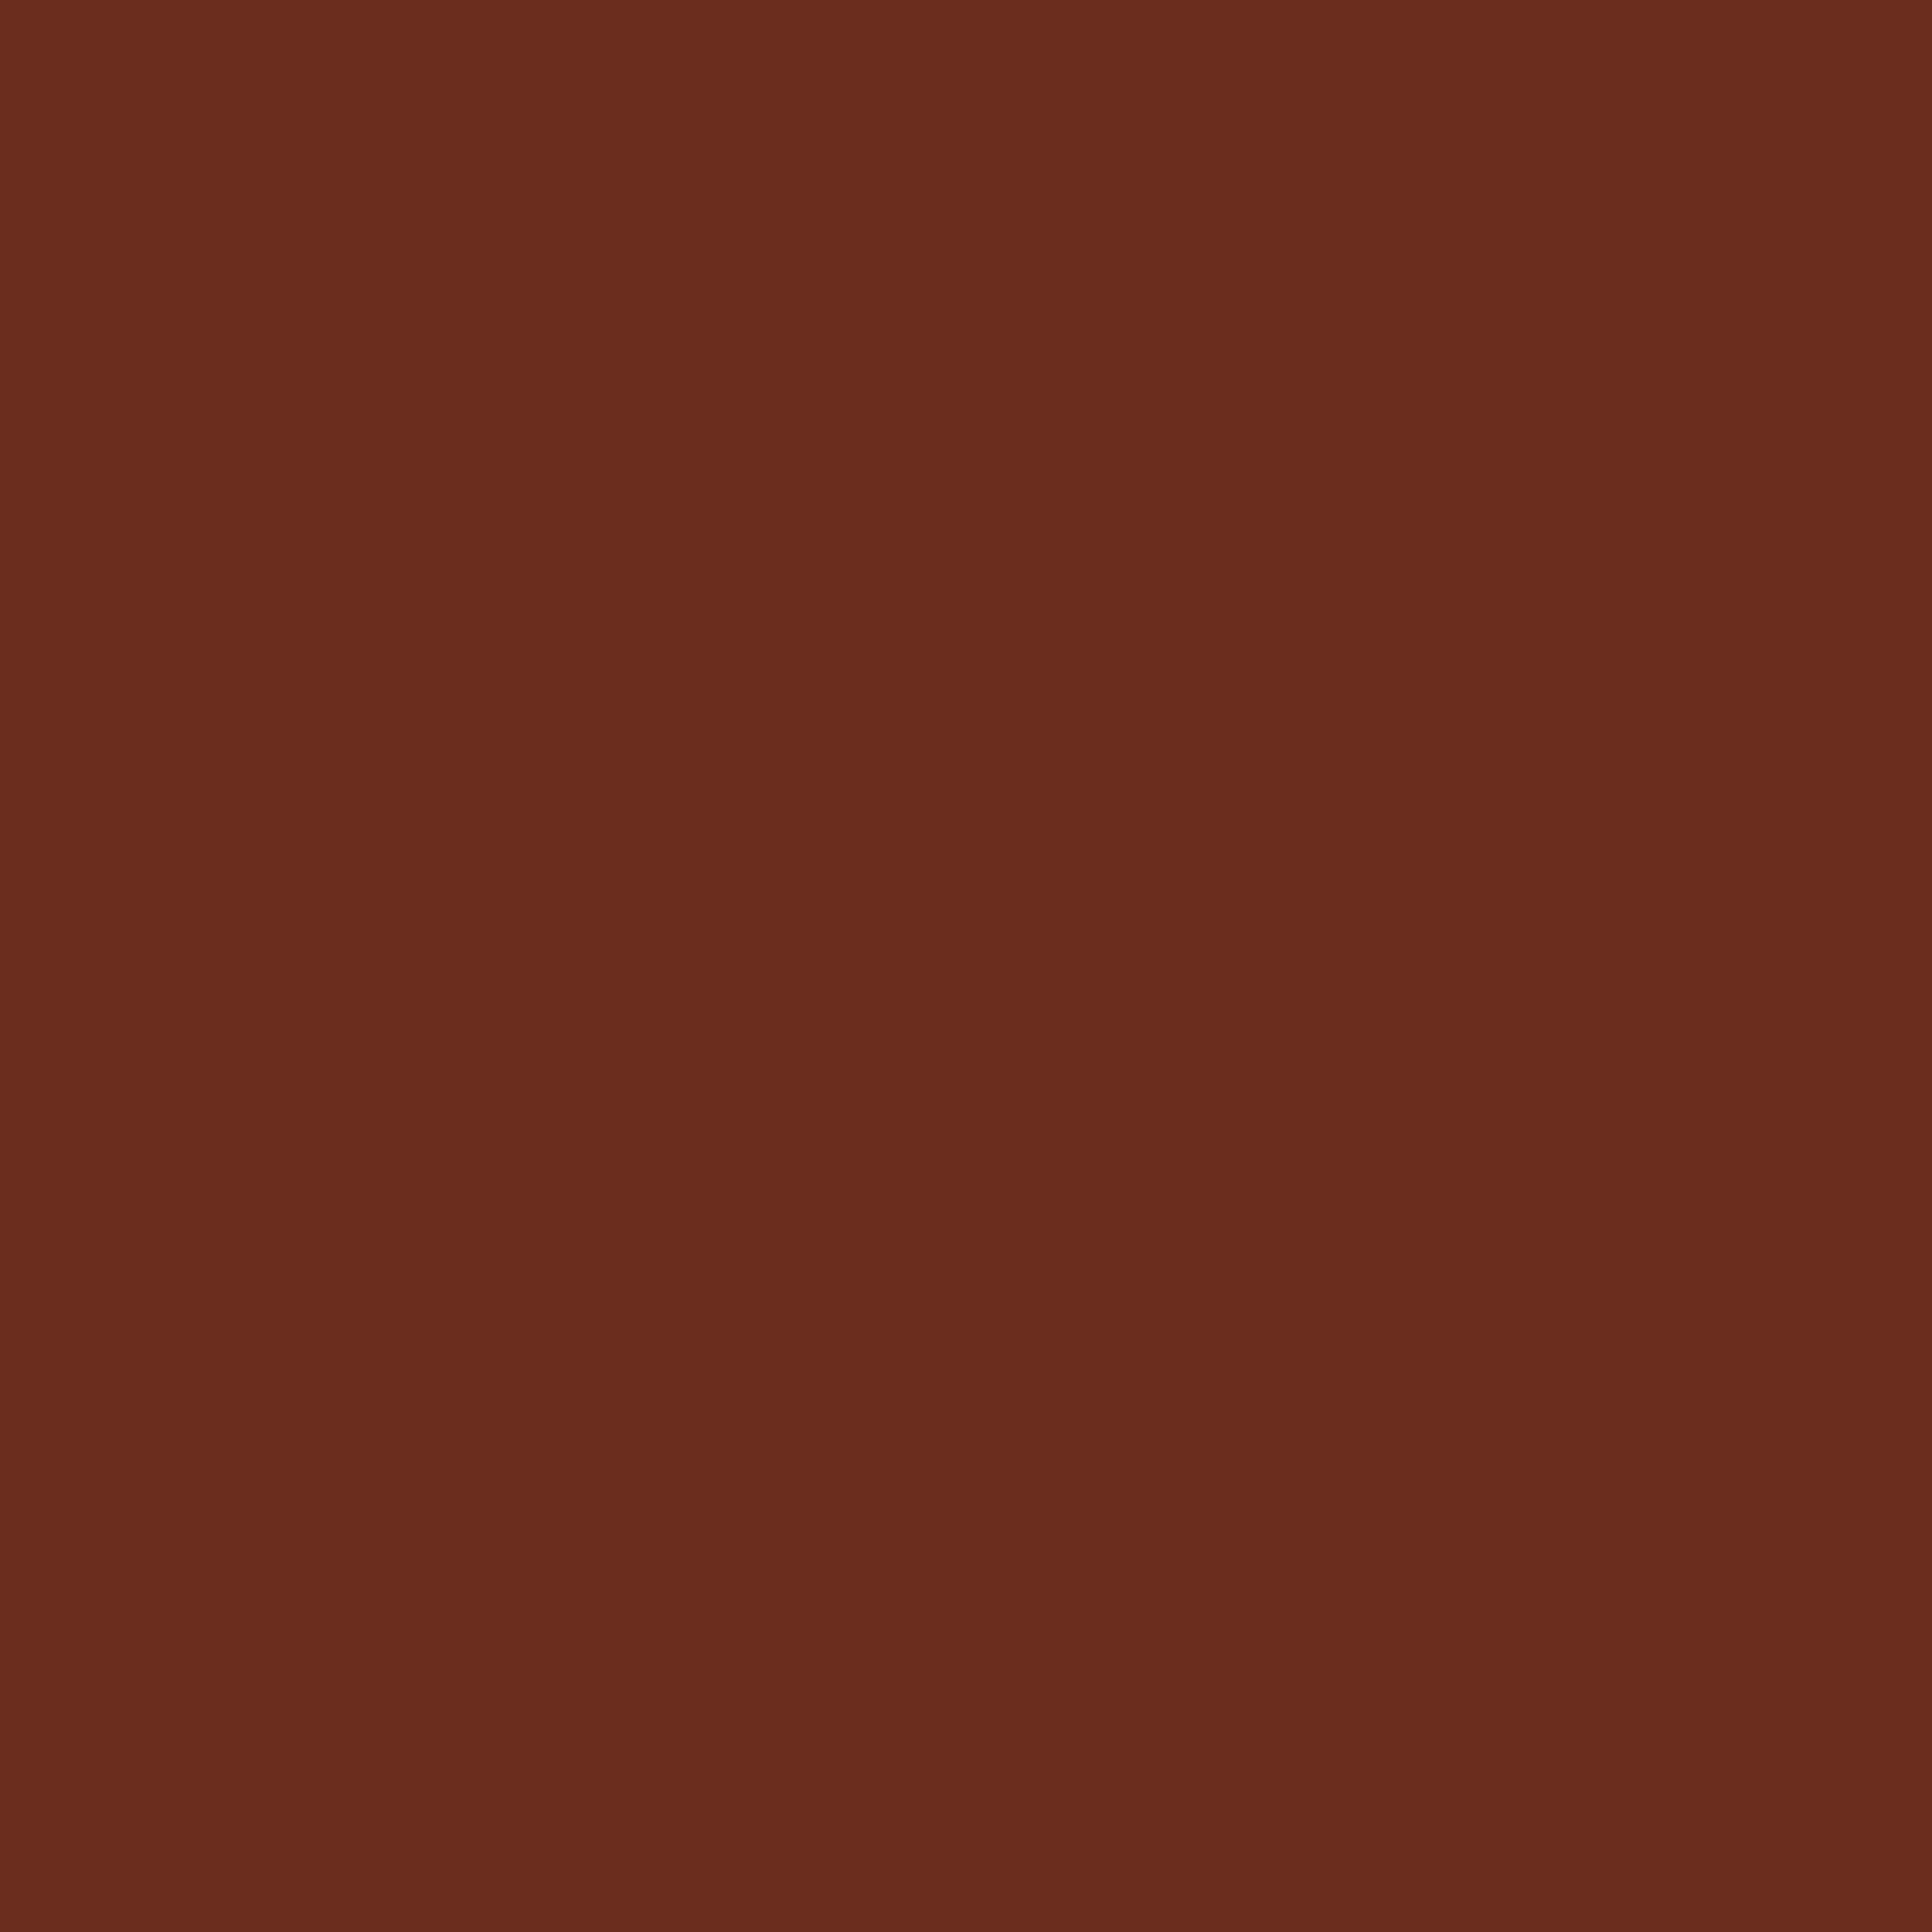 3600x3600 Liver Organ Solid Color Background